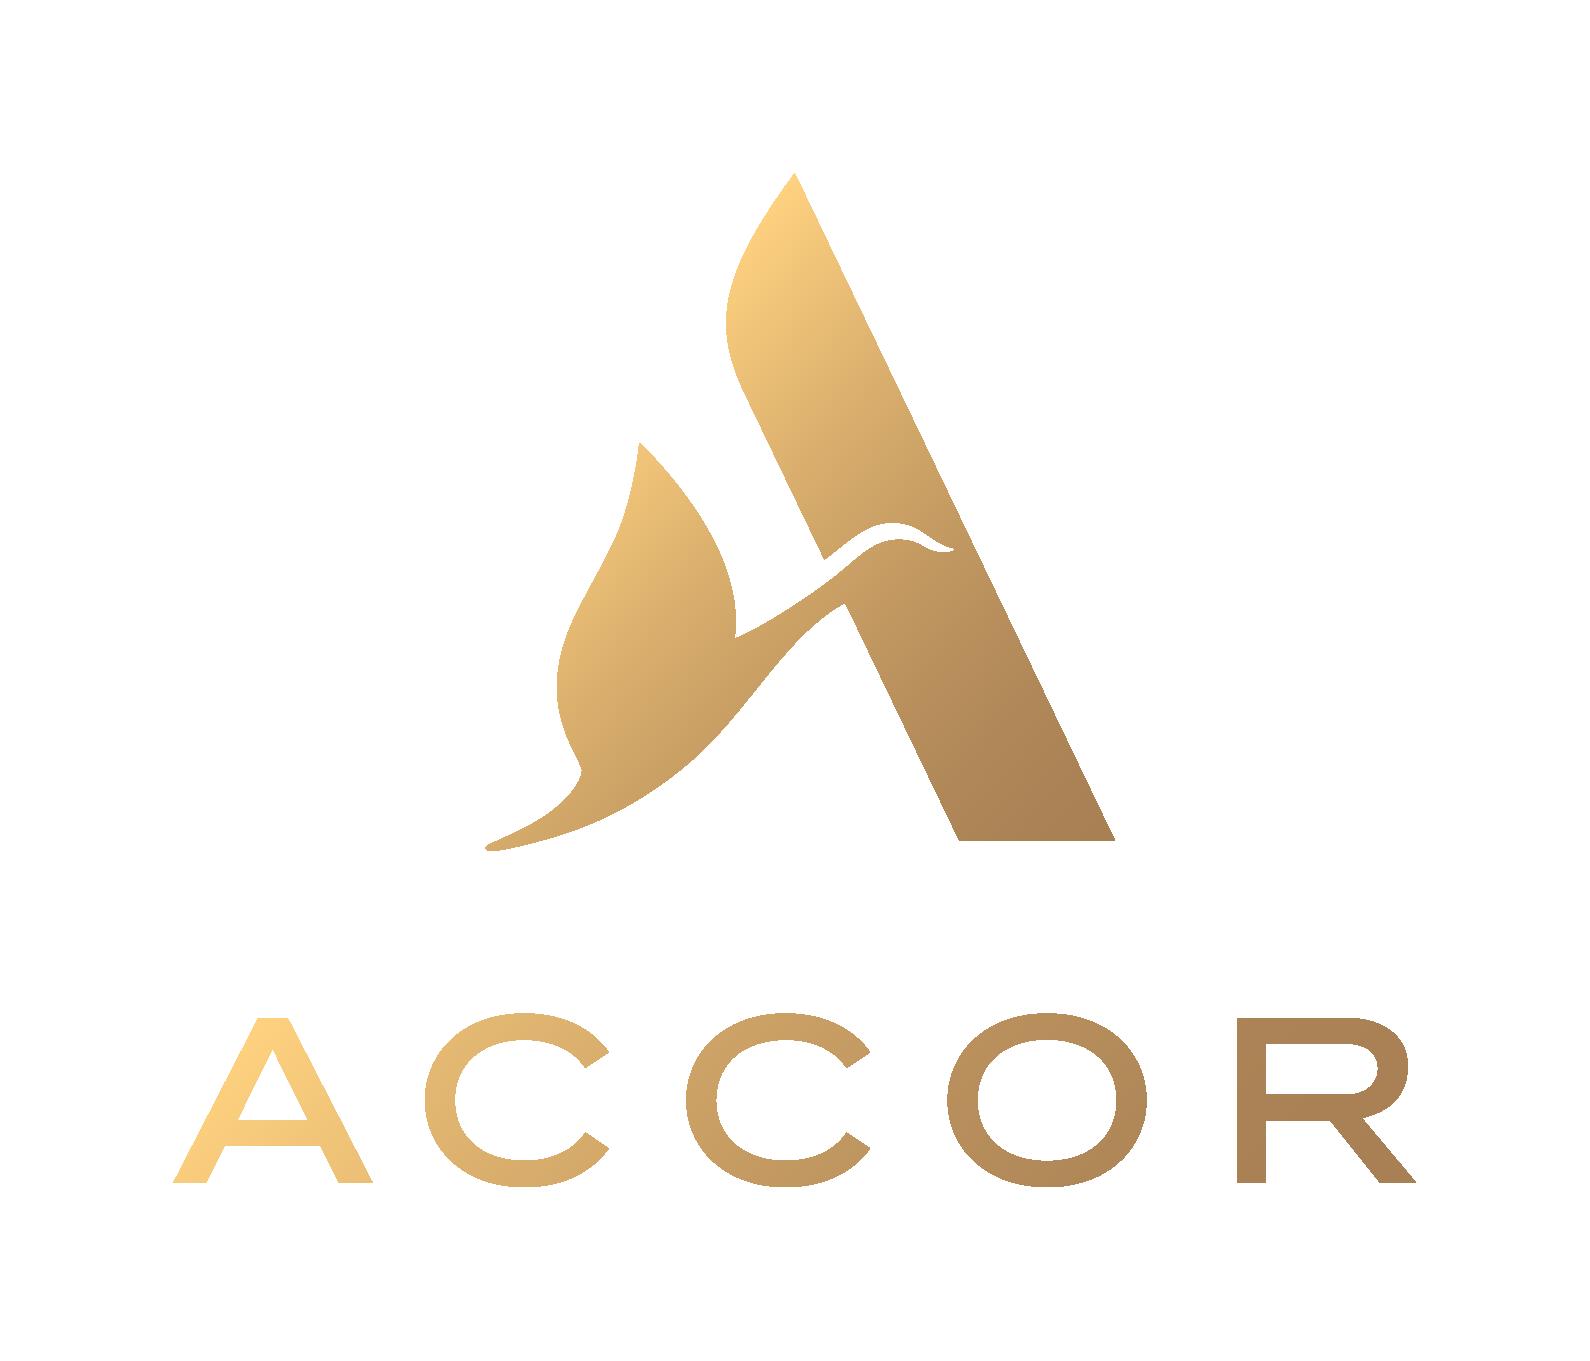 accor_group logo